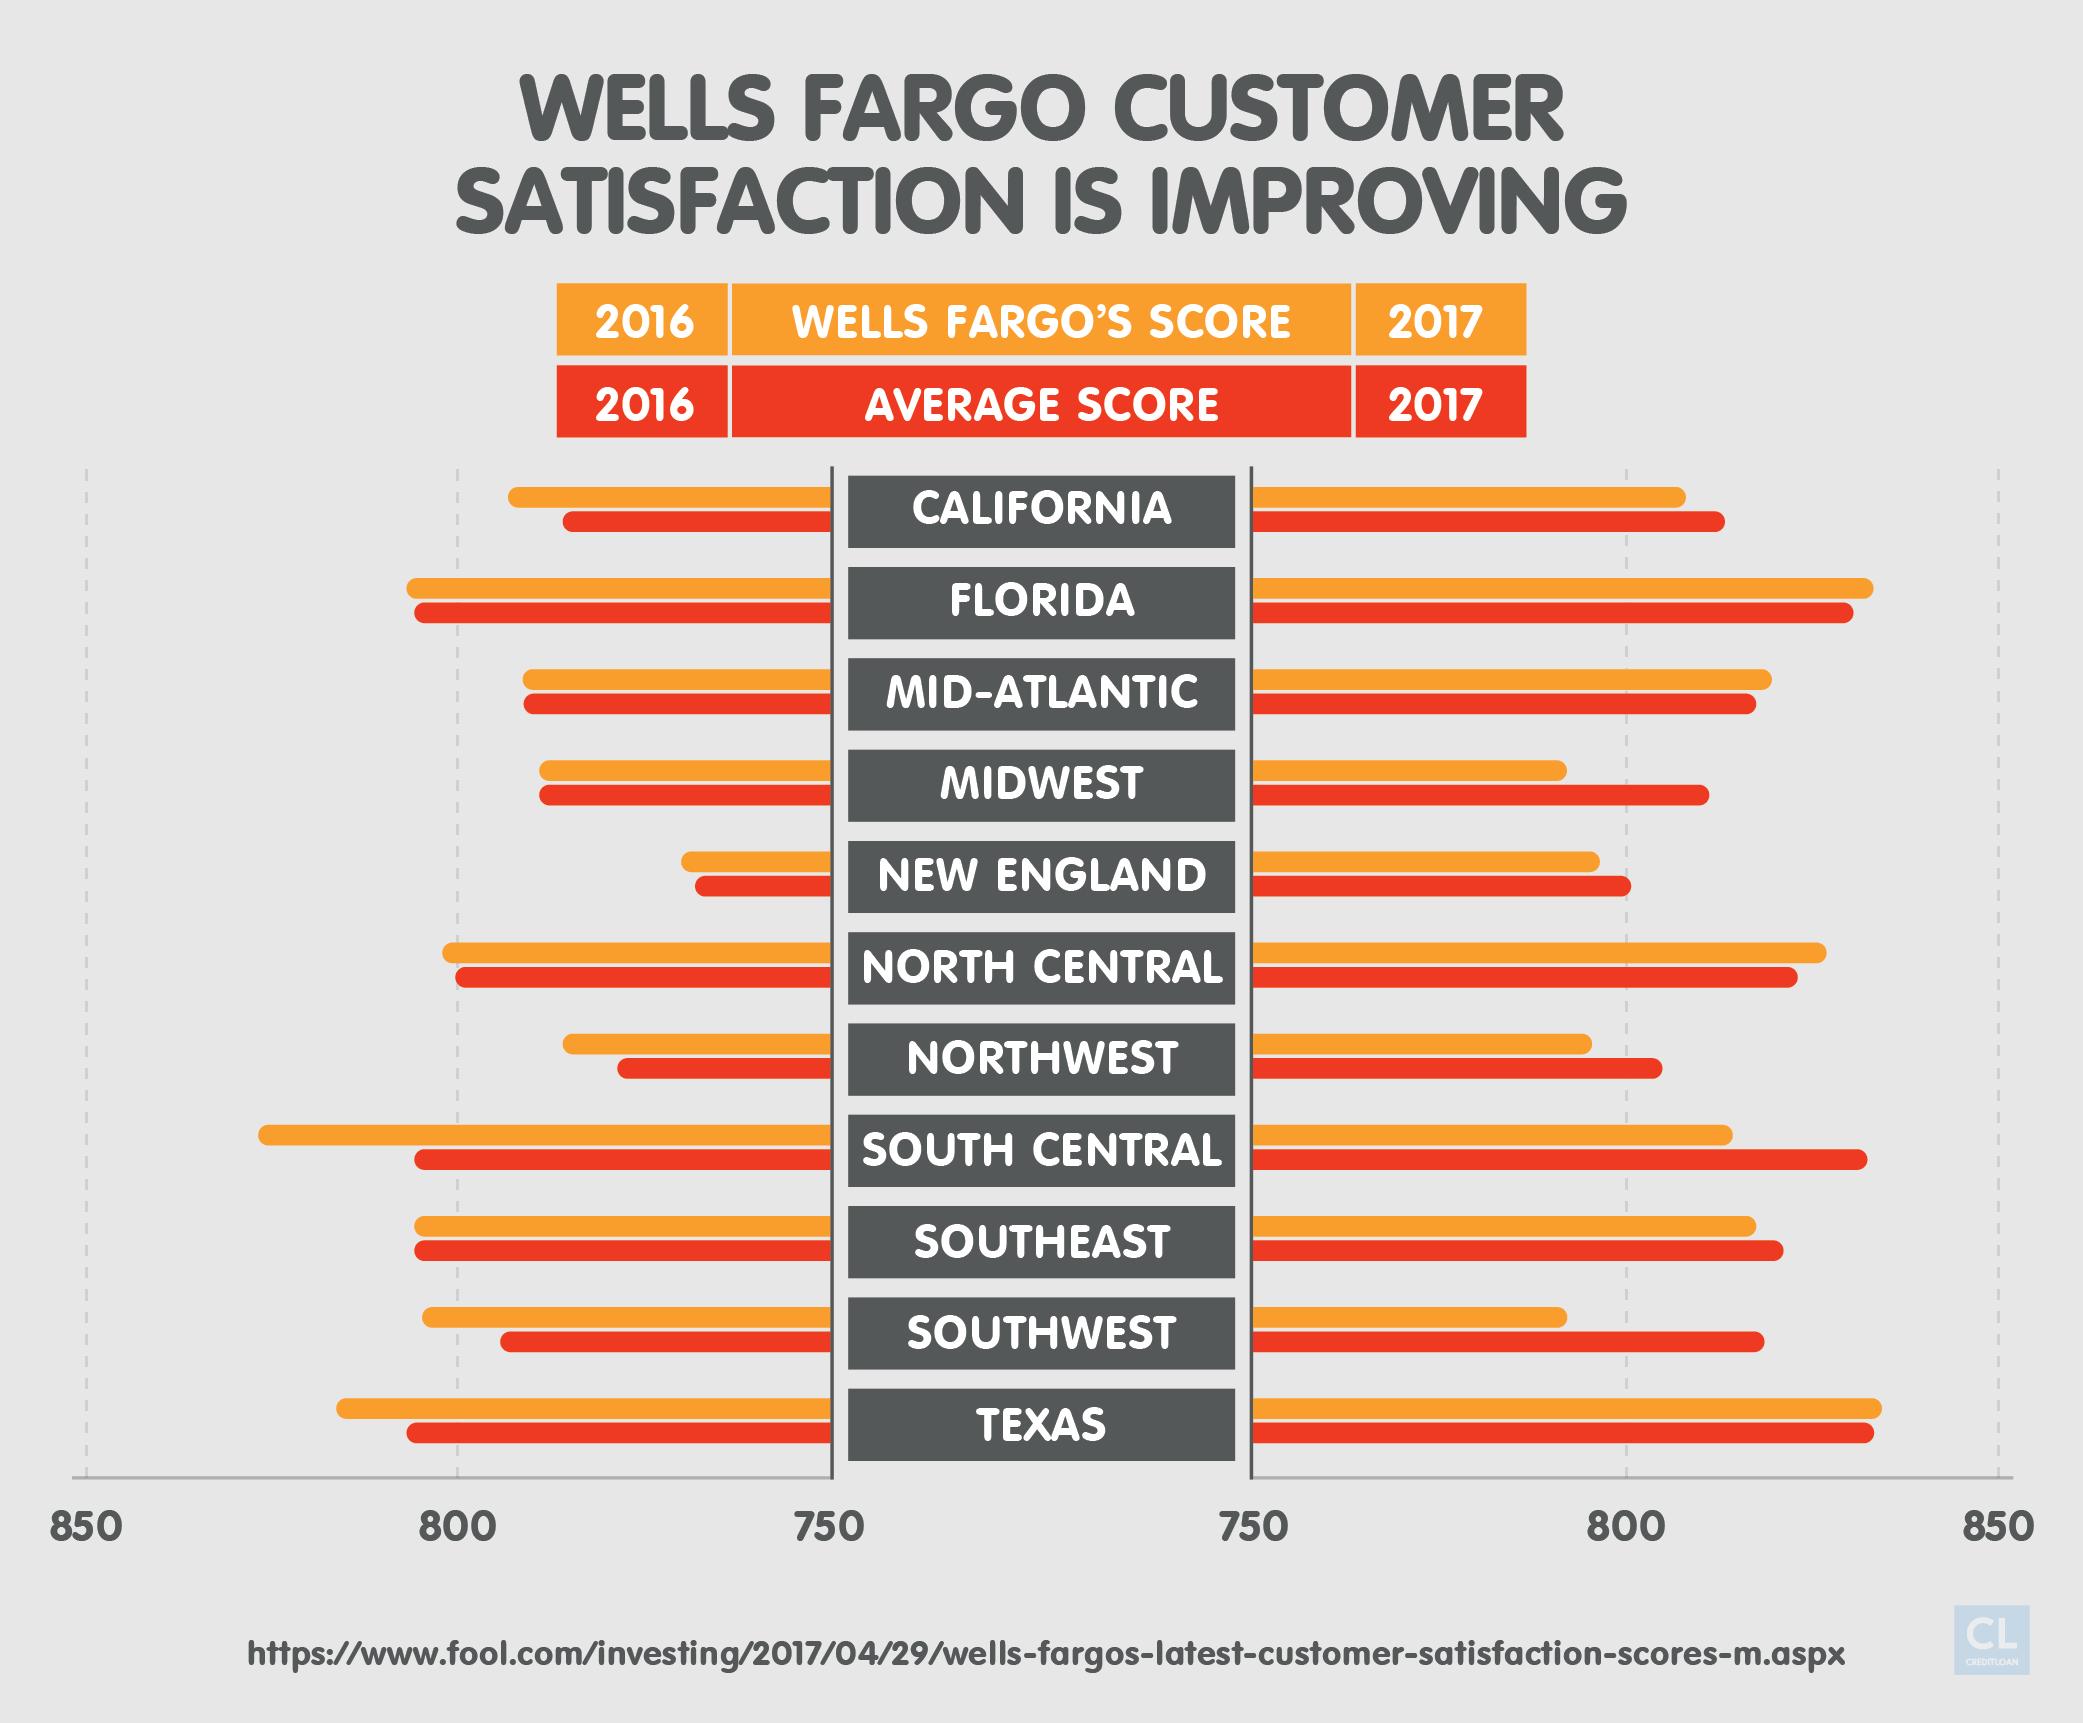 Wells Fargo Customer Satisfaction Compared to Average Scores